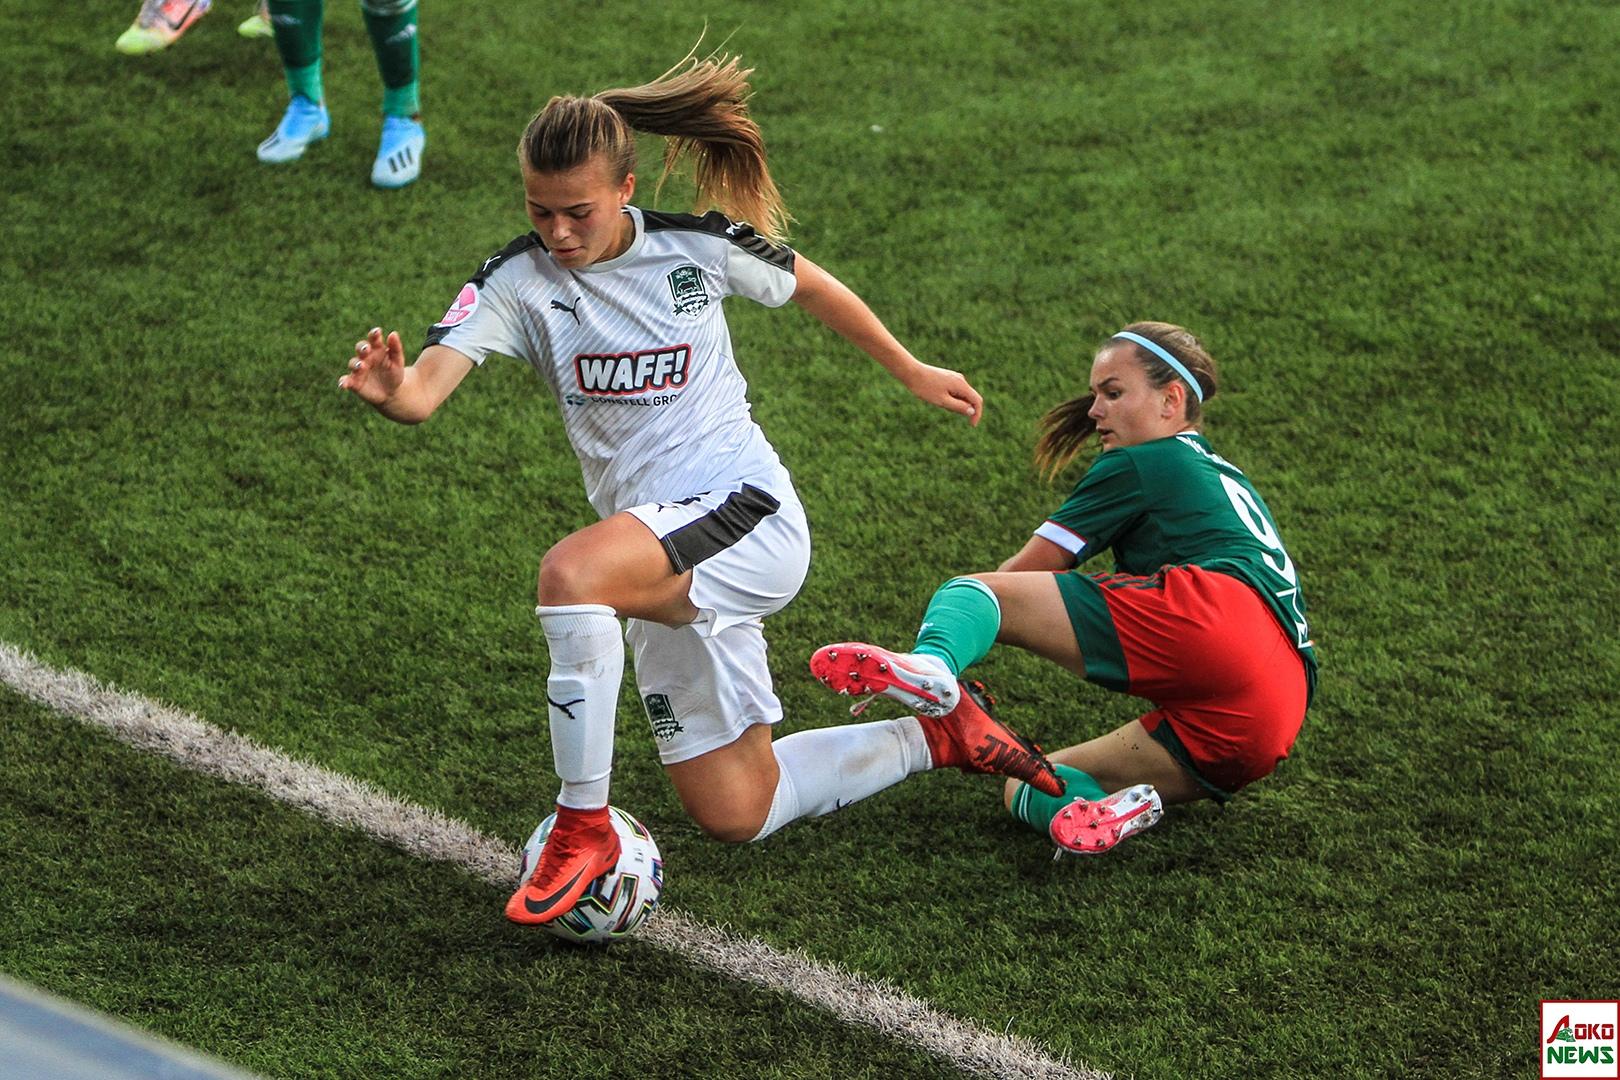 ЖФК Локомотив - ЖФК Краснодар. Фото: Дмитрий Бурдонов / Loko.News